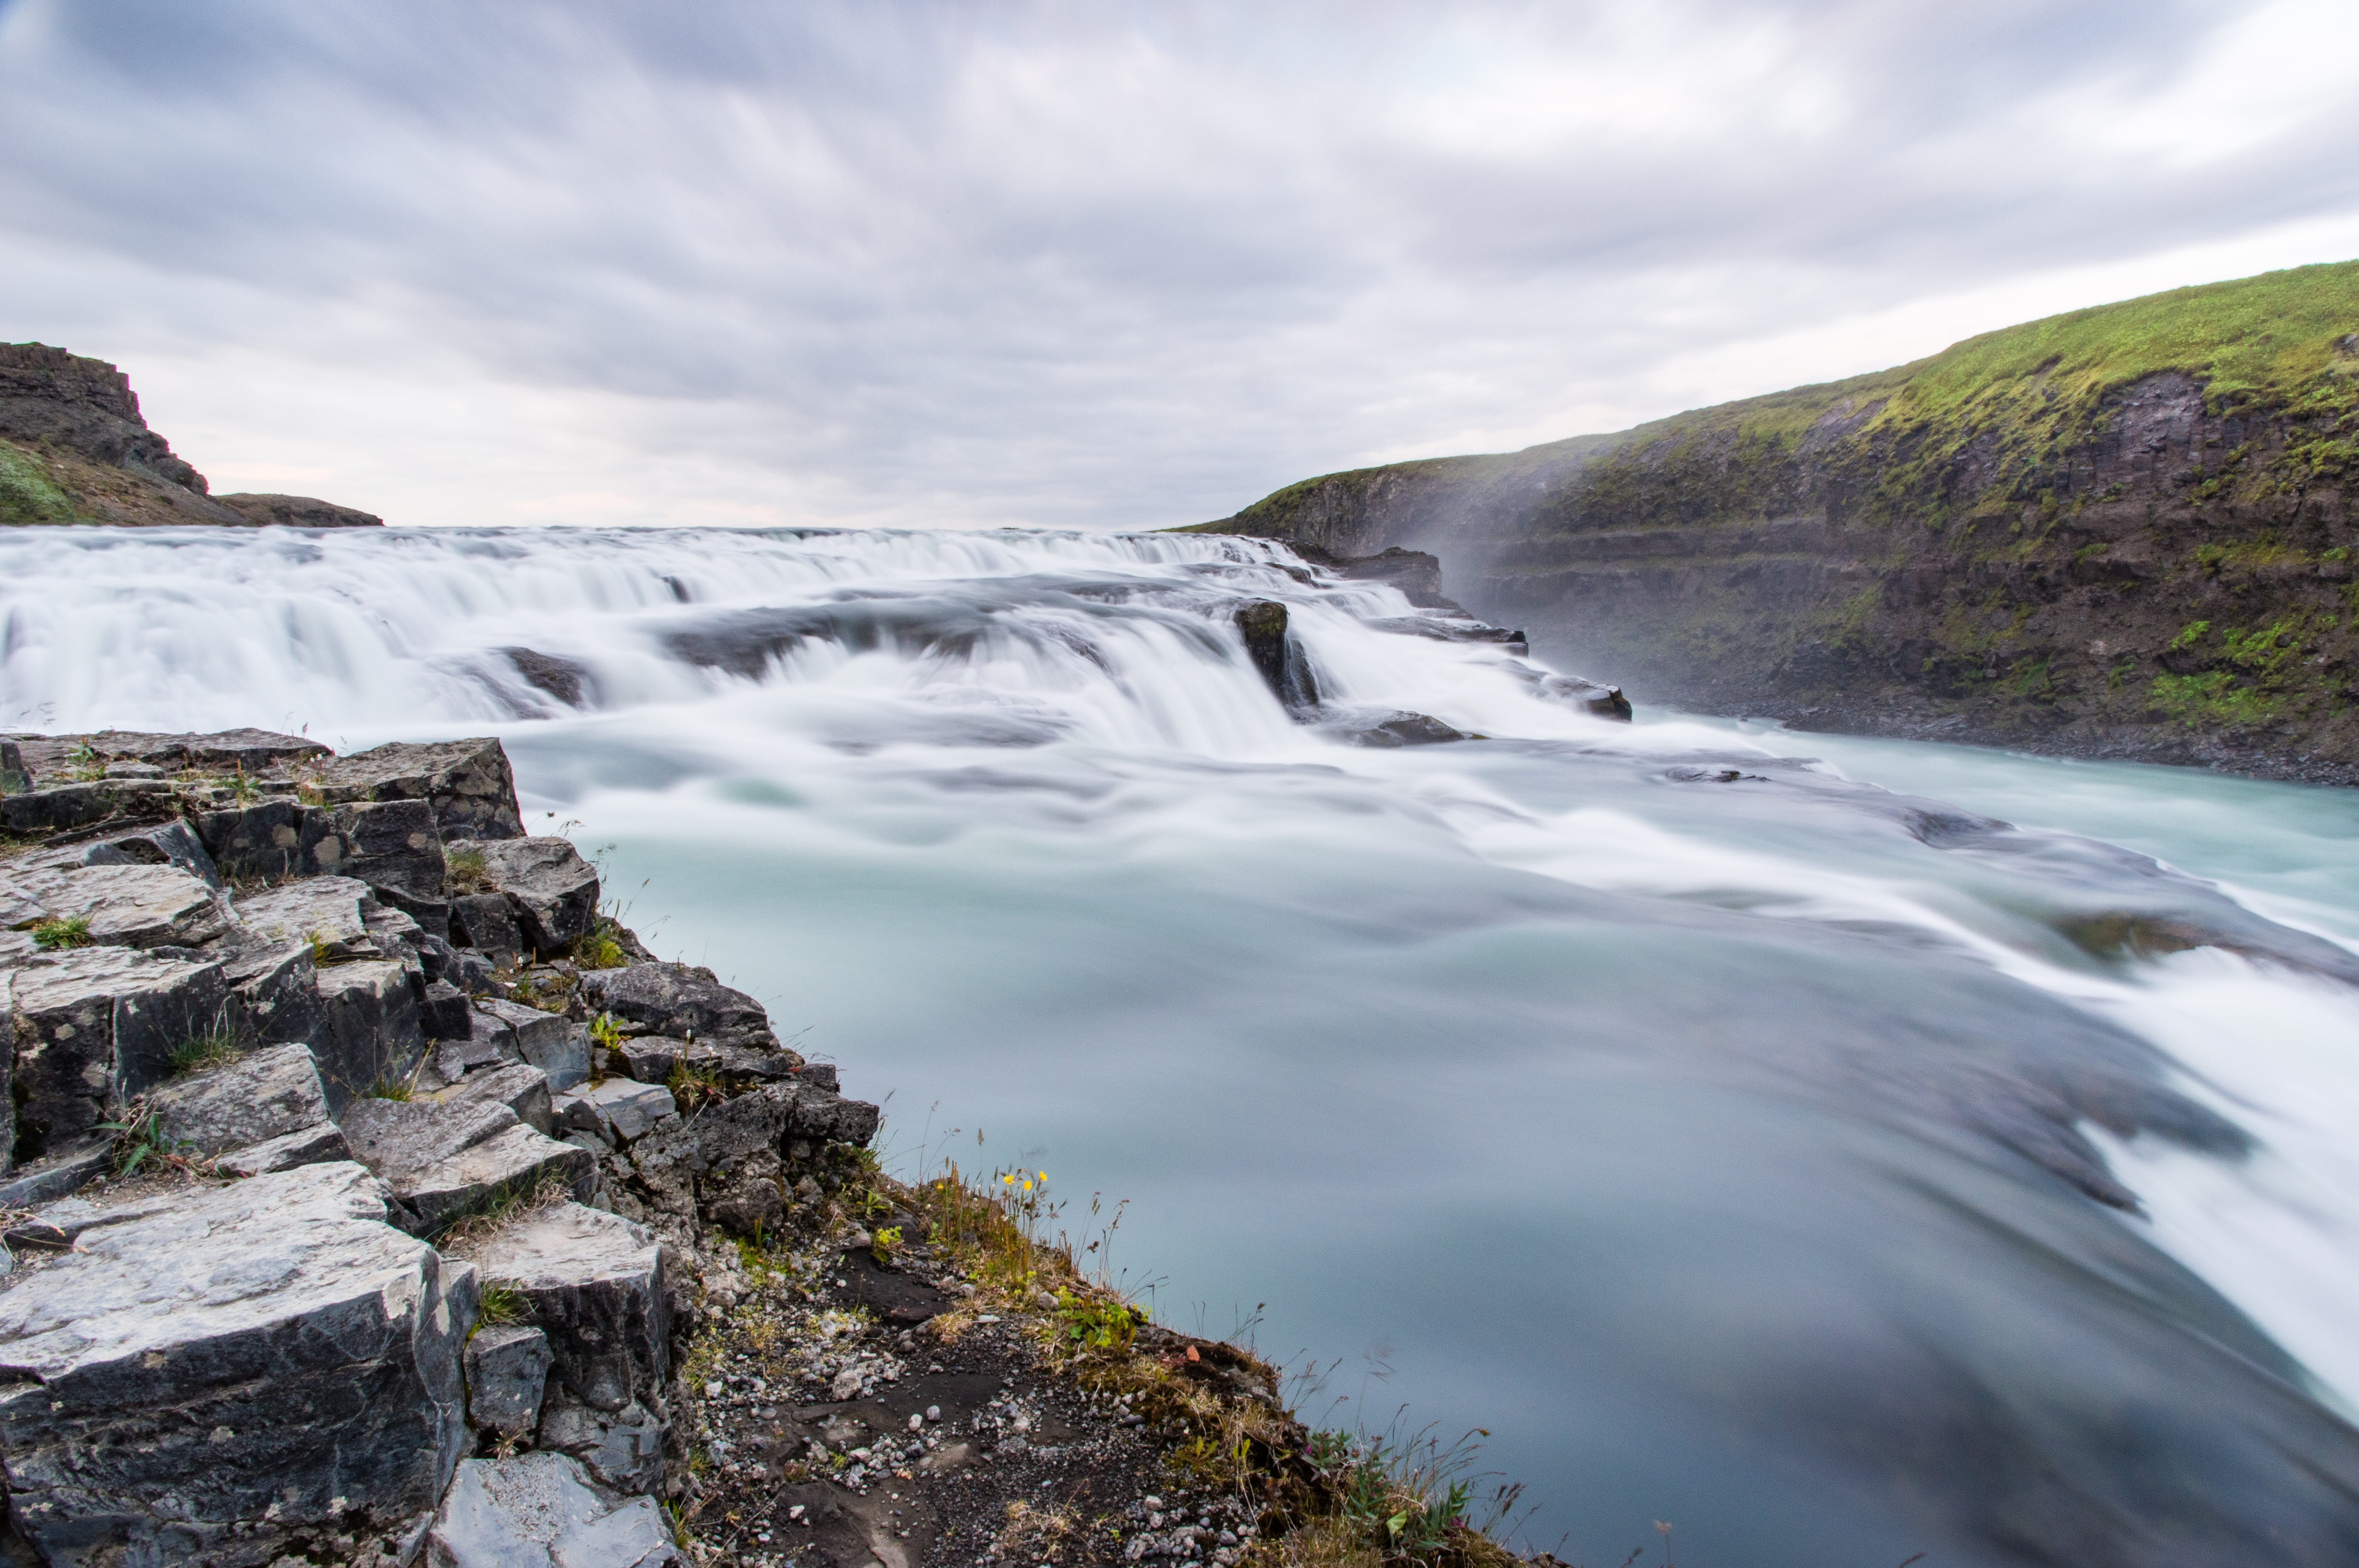 A low waterfall with foamy water flowing down between mossy rocks